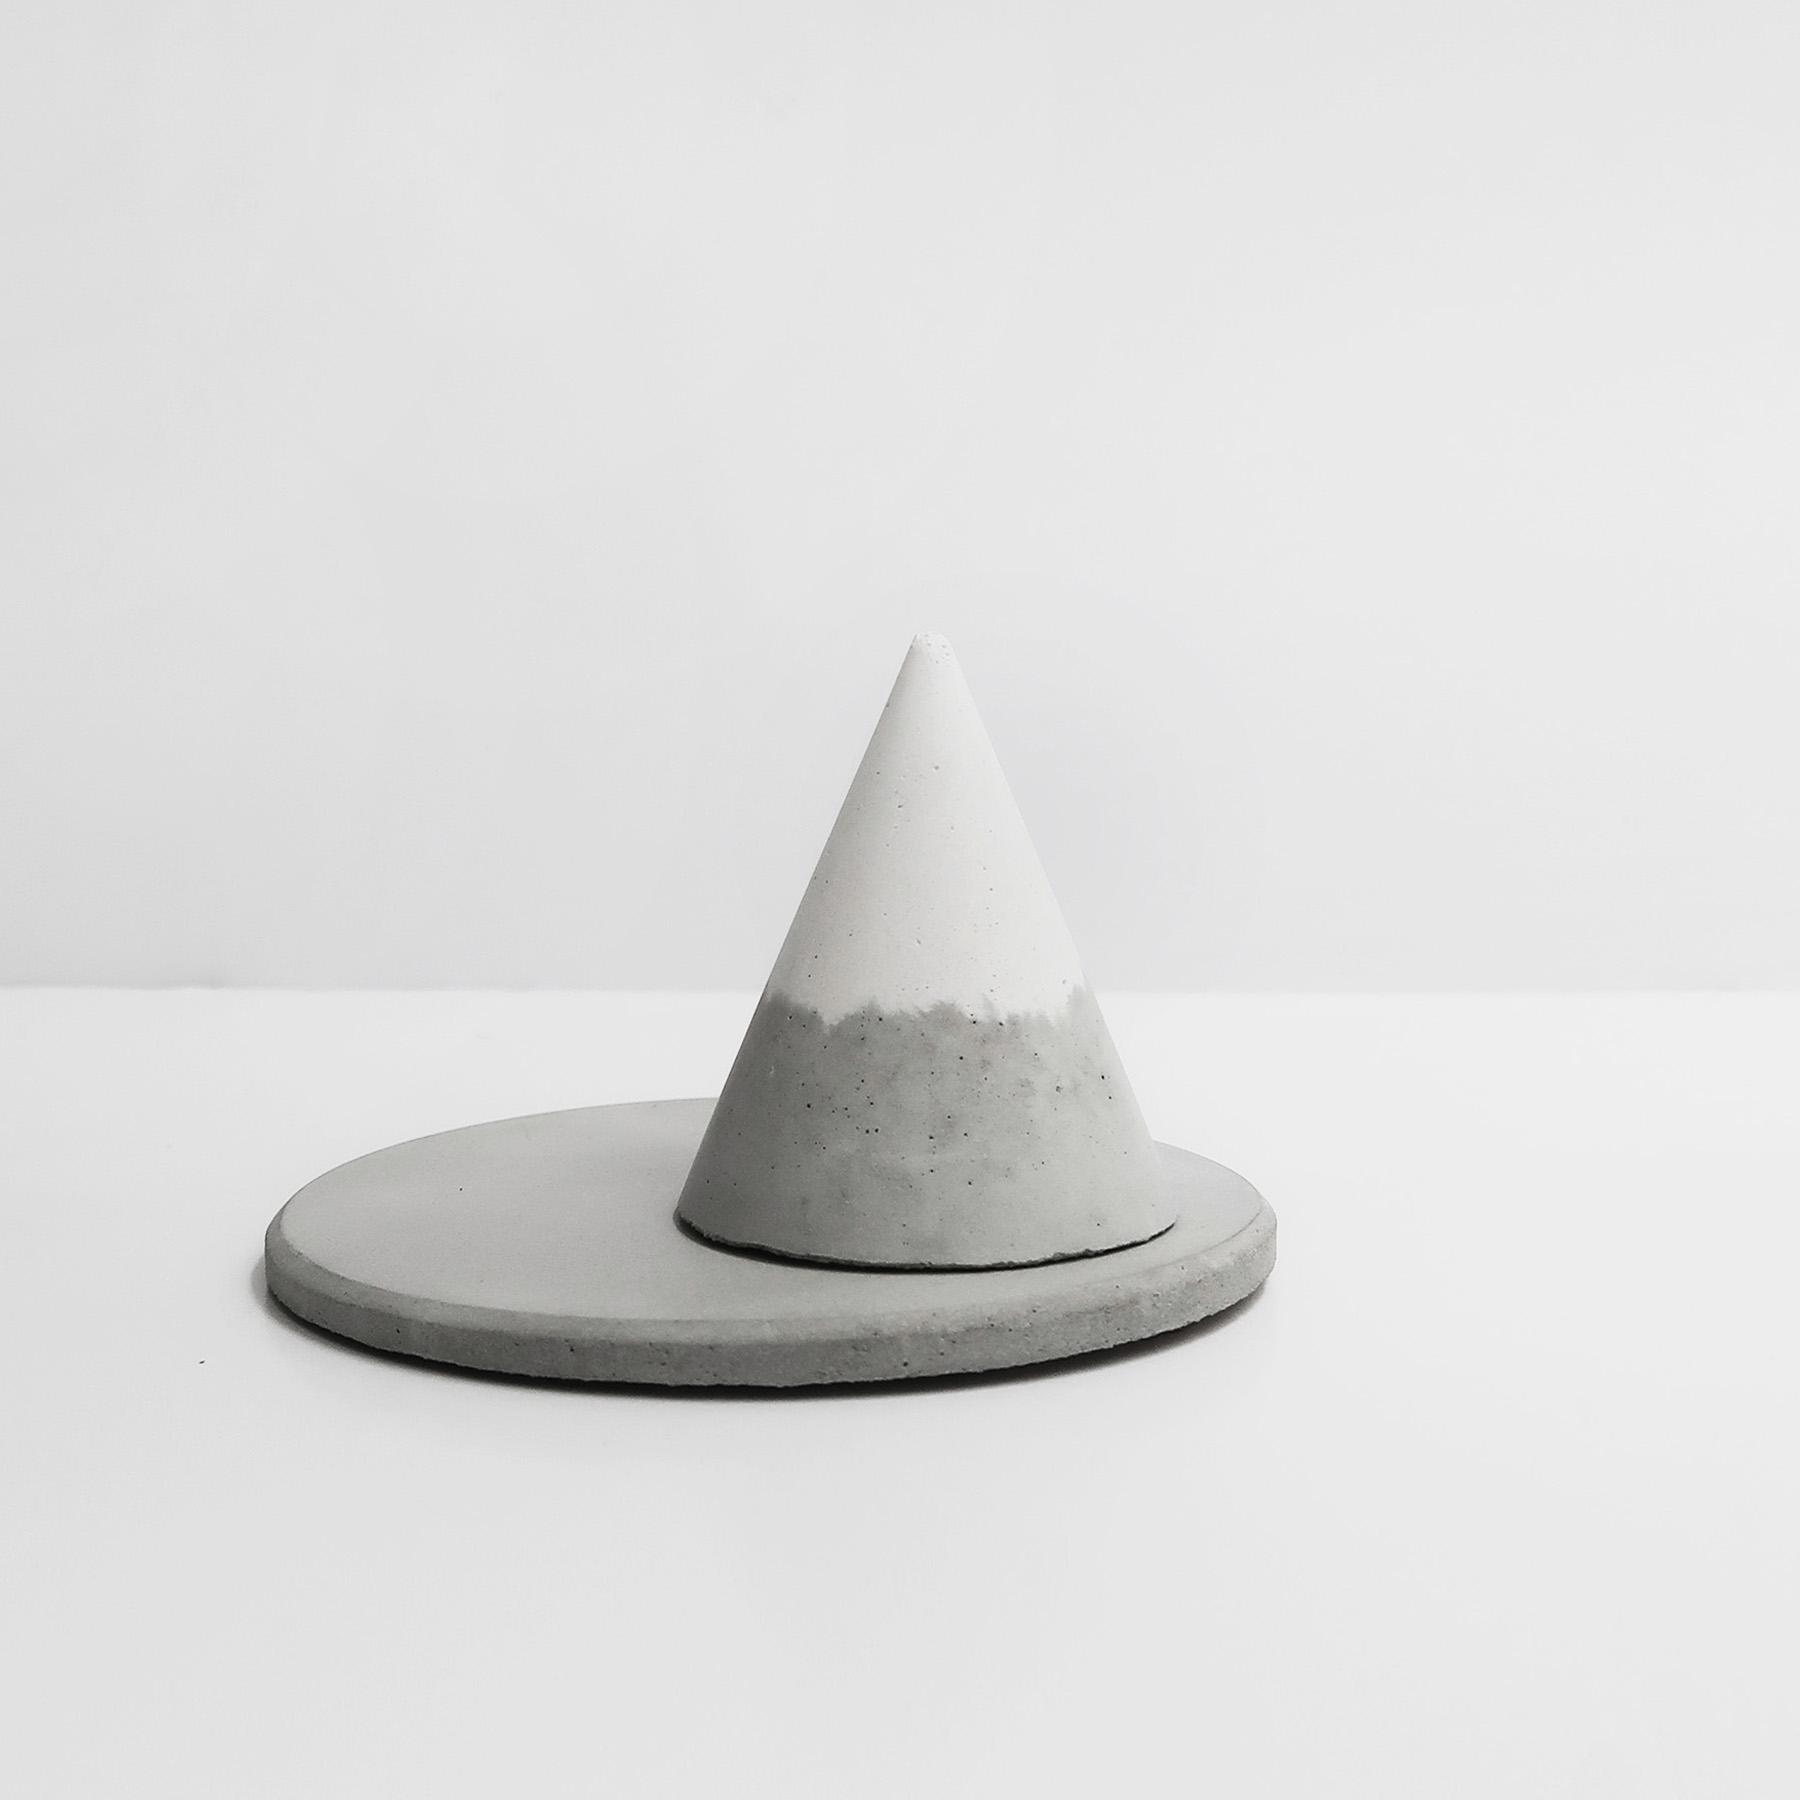 SNOWPACK 小山雪戒指座飾品盤收納2件組 / Concrete ring holders + trinket dish